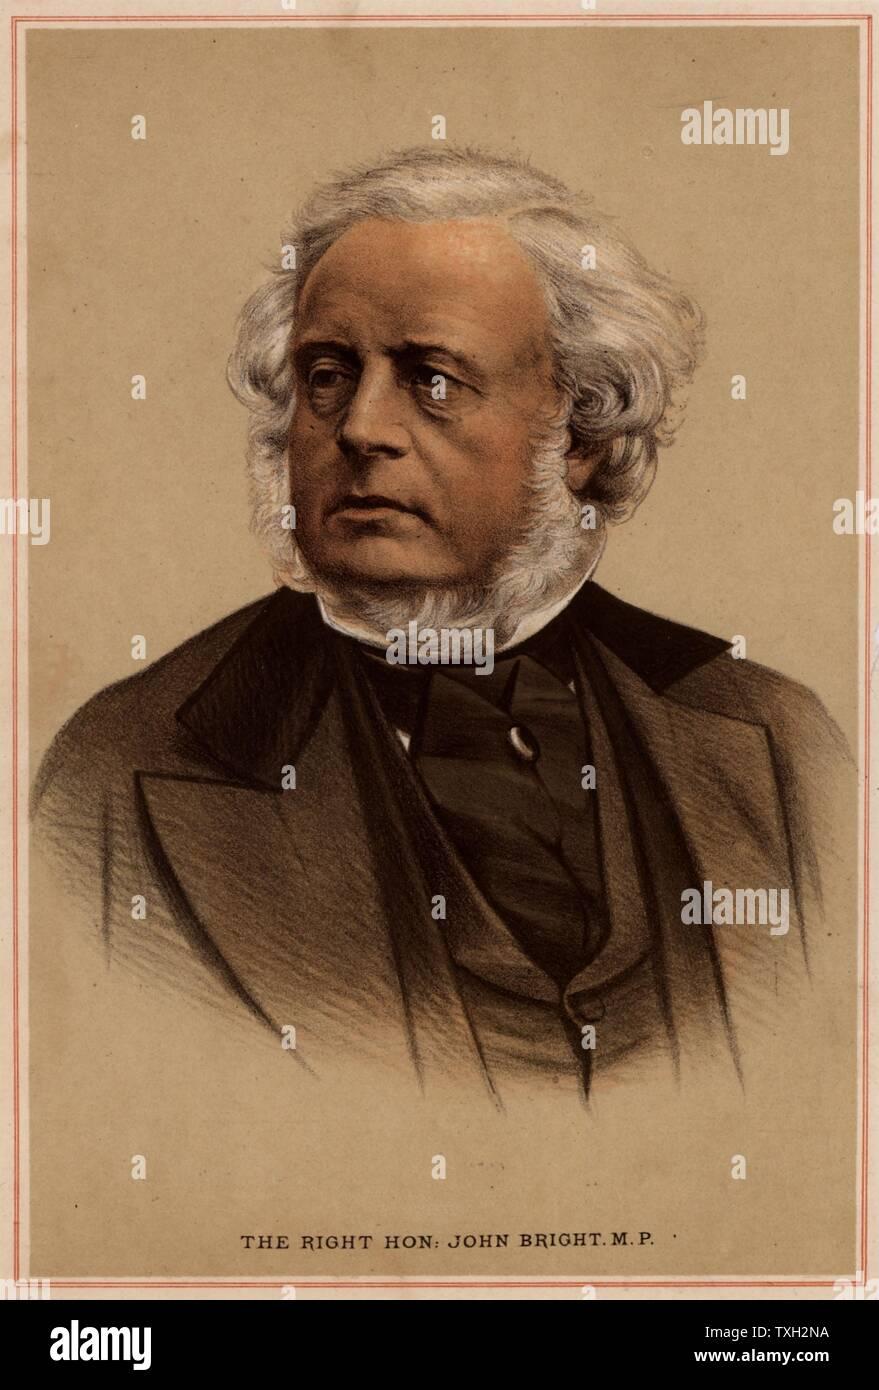 John Bright (1811-1889) British radical statesman, born in Rochdale, Lancashire. Anti-Corn Law League. Reform Act 1867. Tinted lithograph. Stock Photo